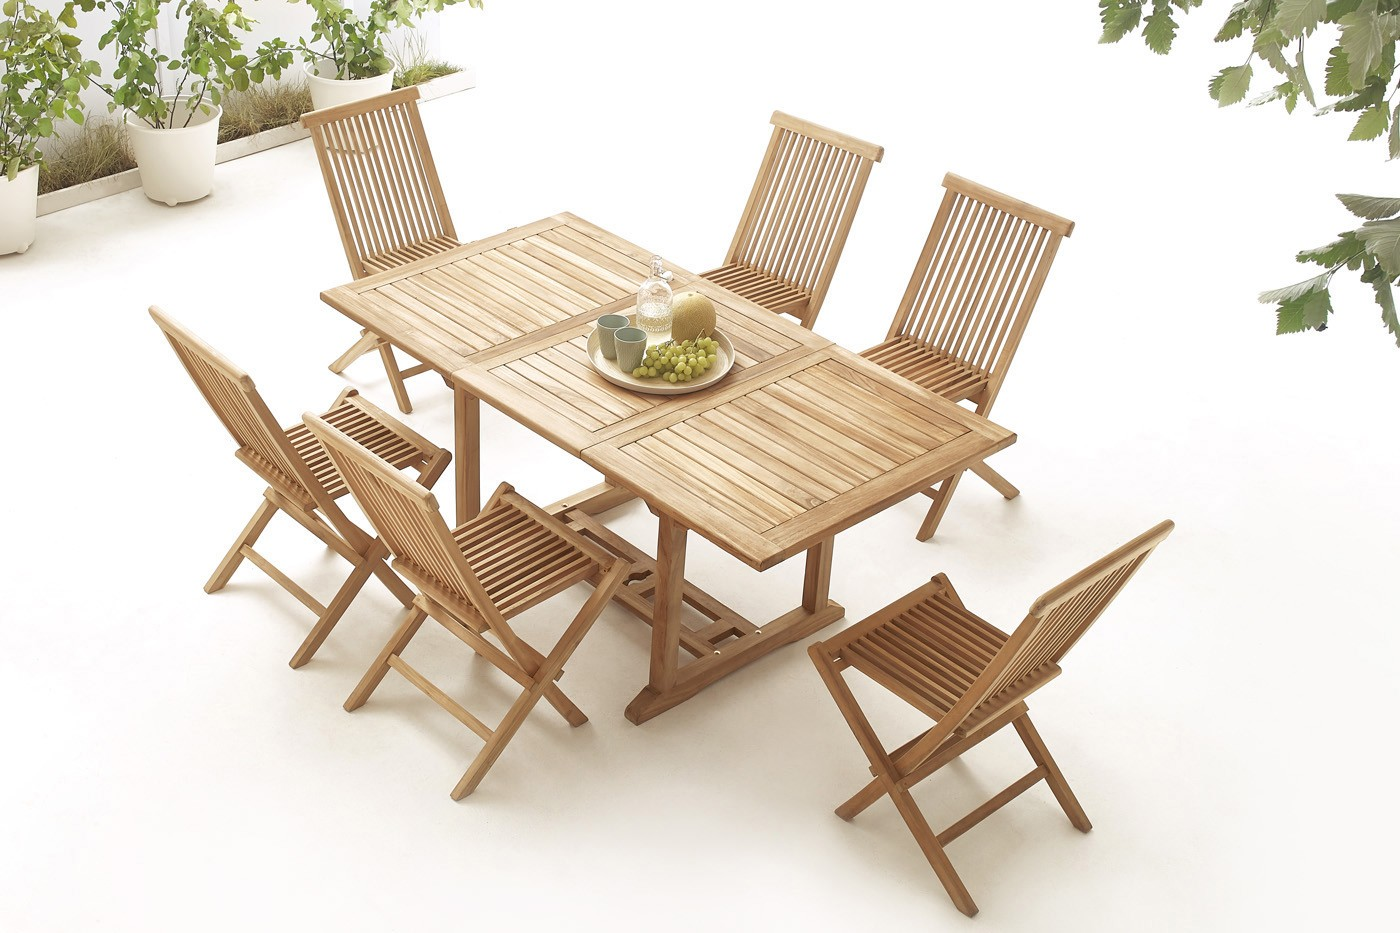 Fabelhaft Tisch Massiv Ideen Von Rechteck 4 Stühle + 2 Sessel Roh